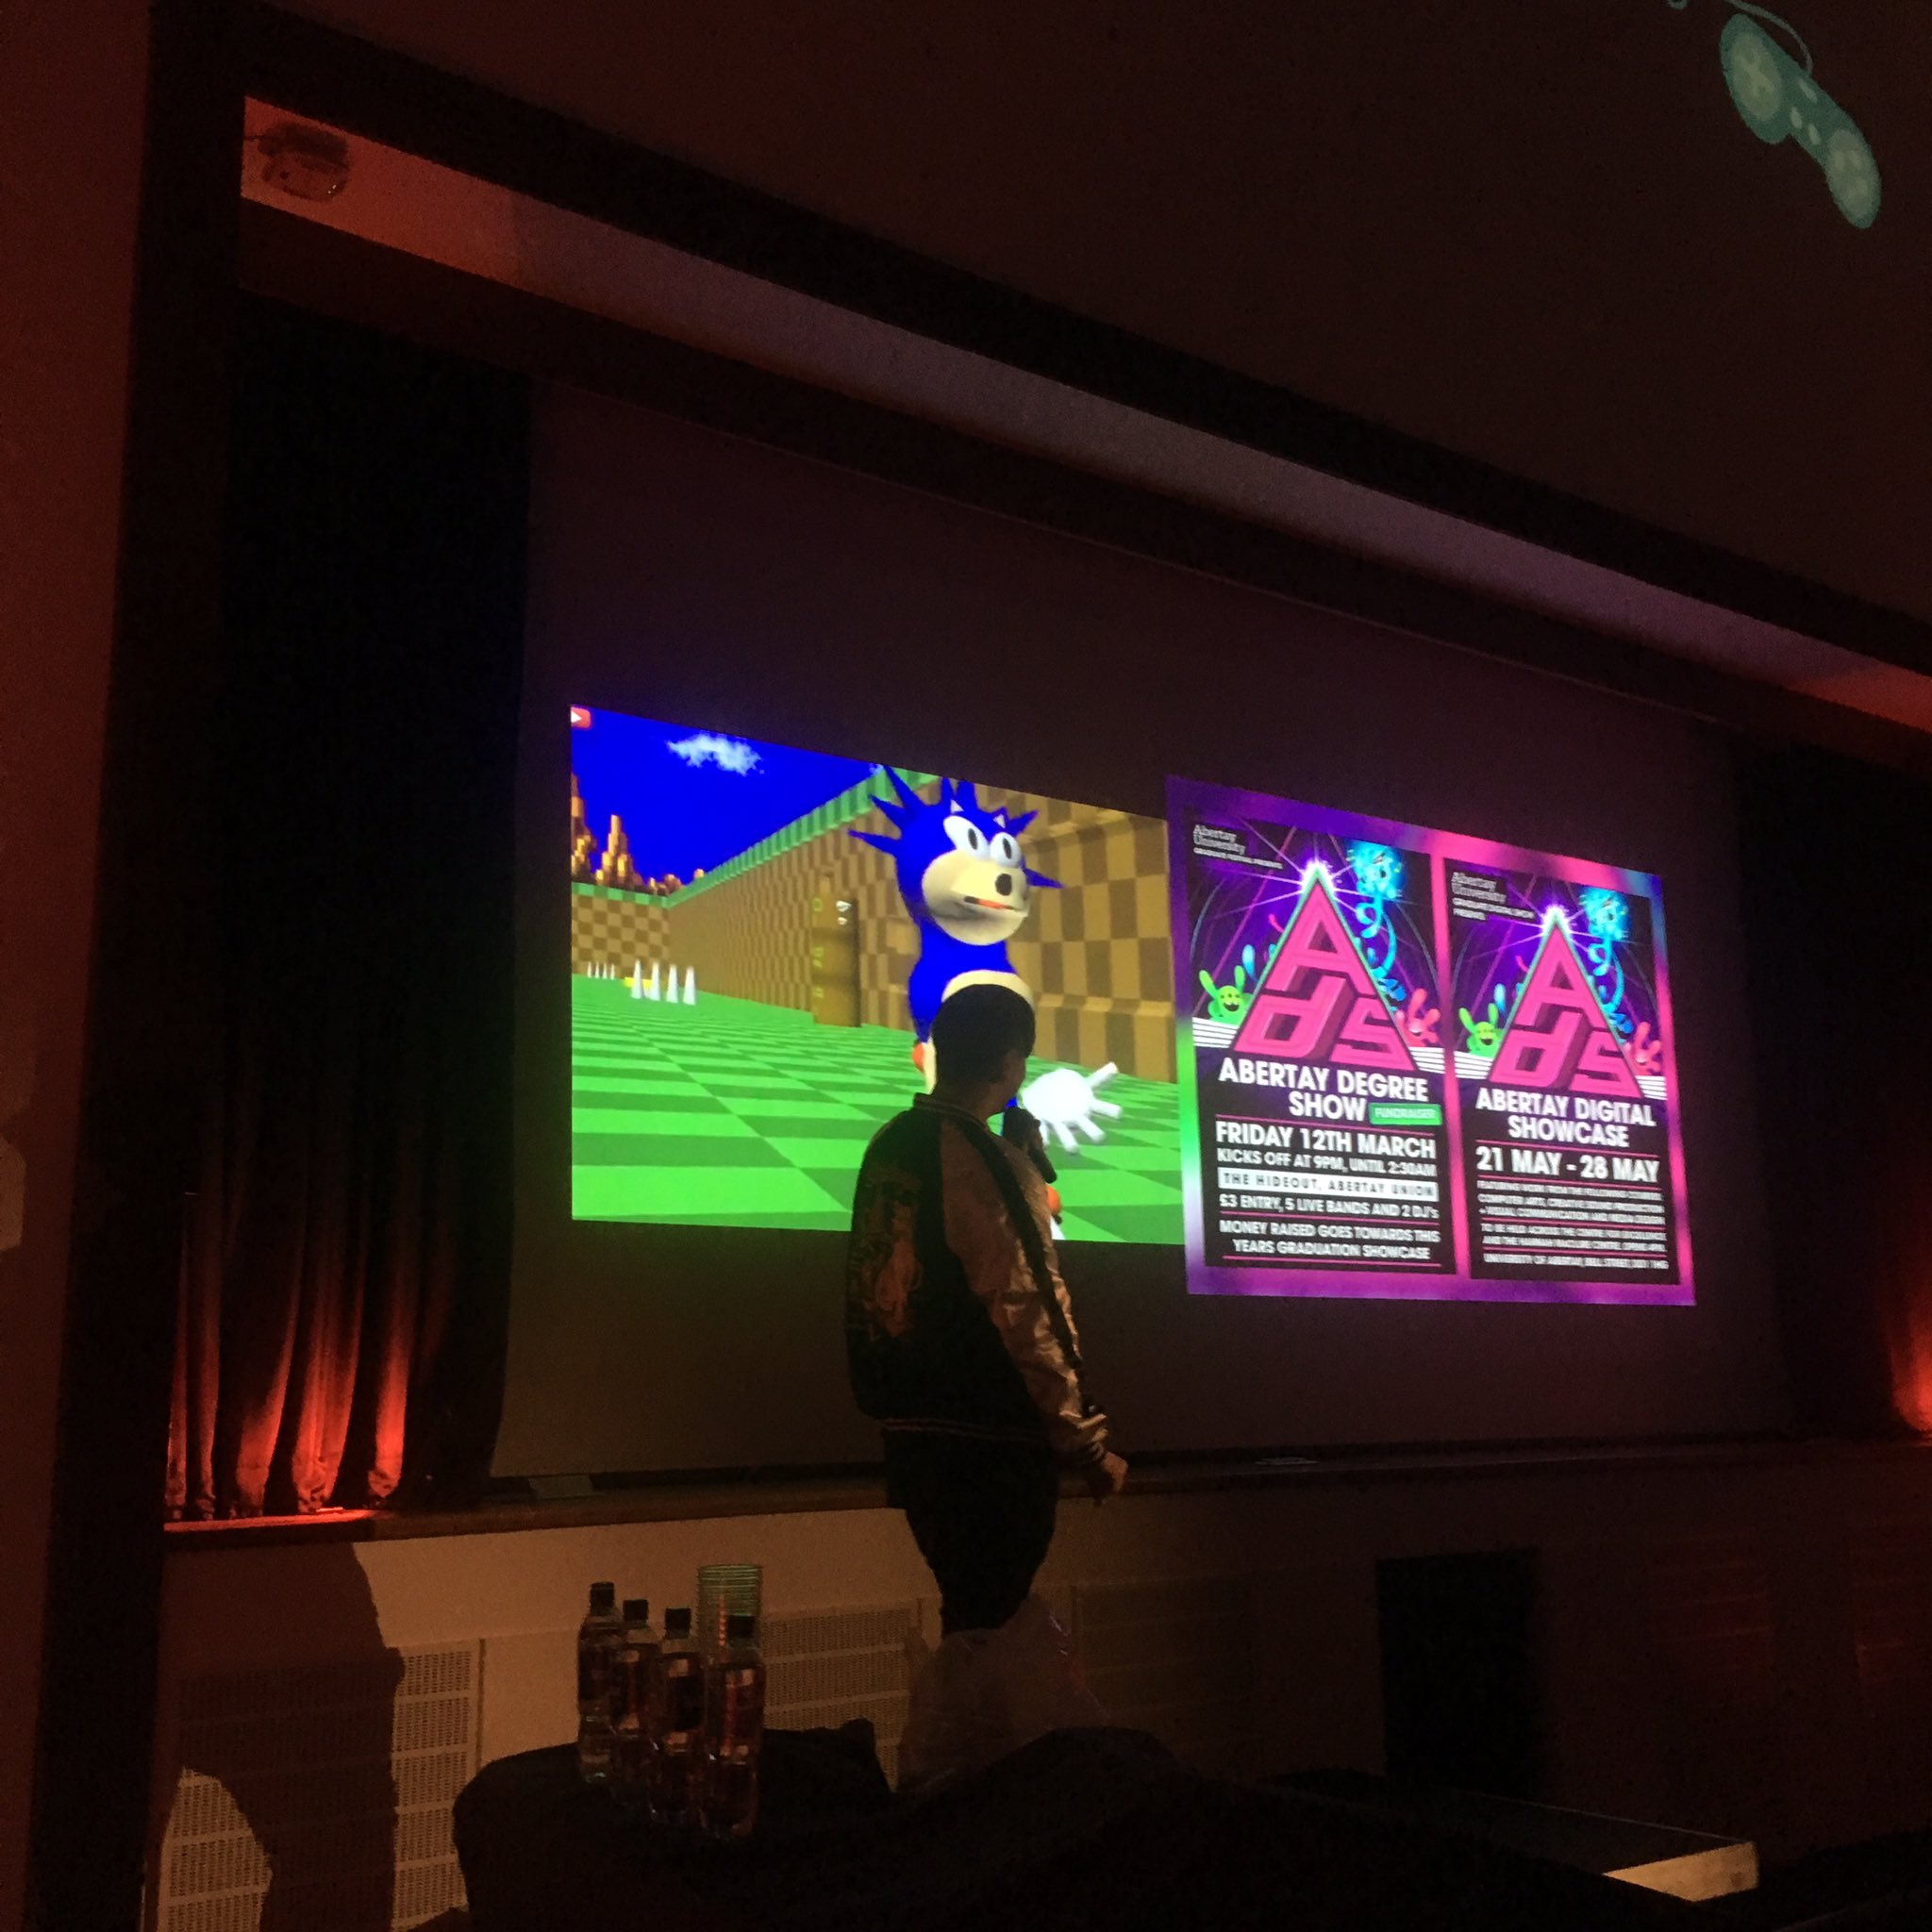 There's @liamwong keeping the Pecha Kucha on brand  #GamesPK https://t.co/qF52RV6dMv